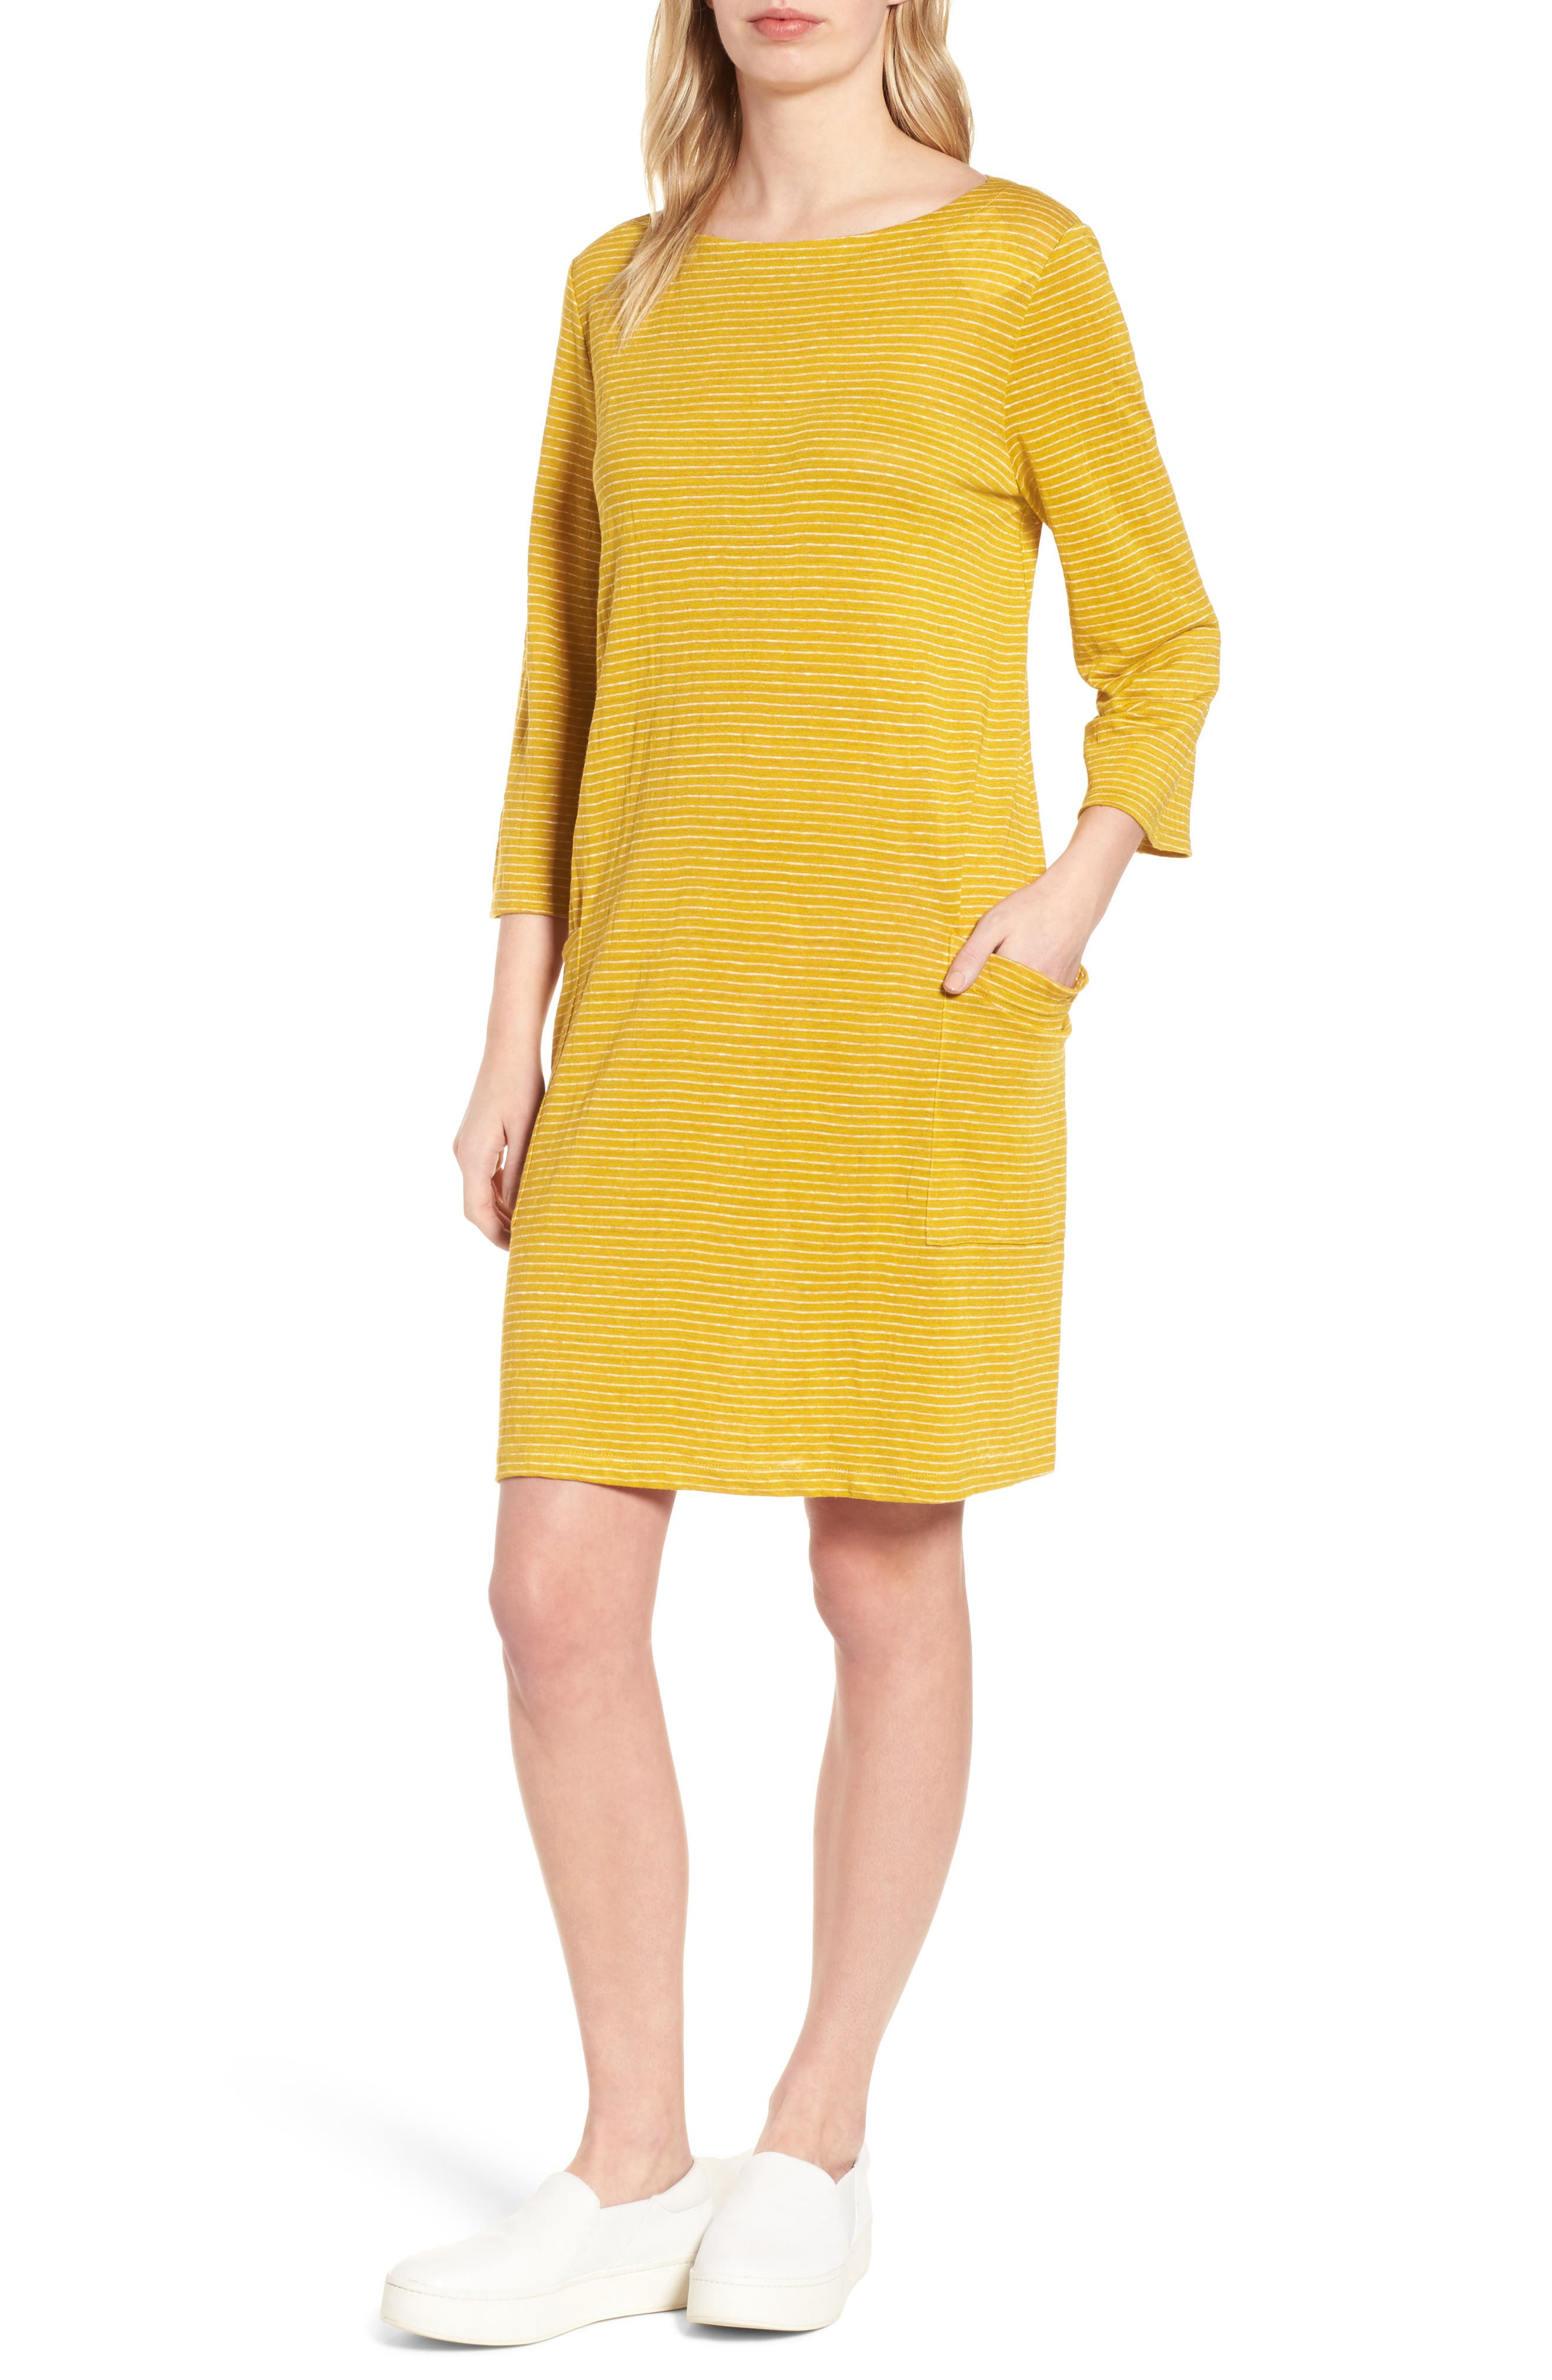 Yellow knee length dress